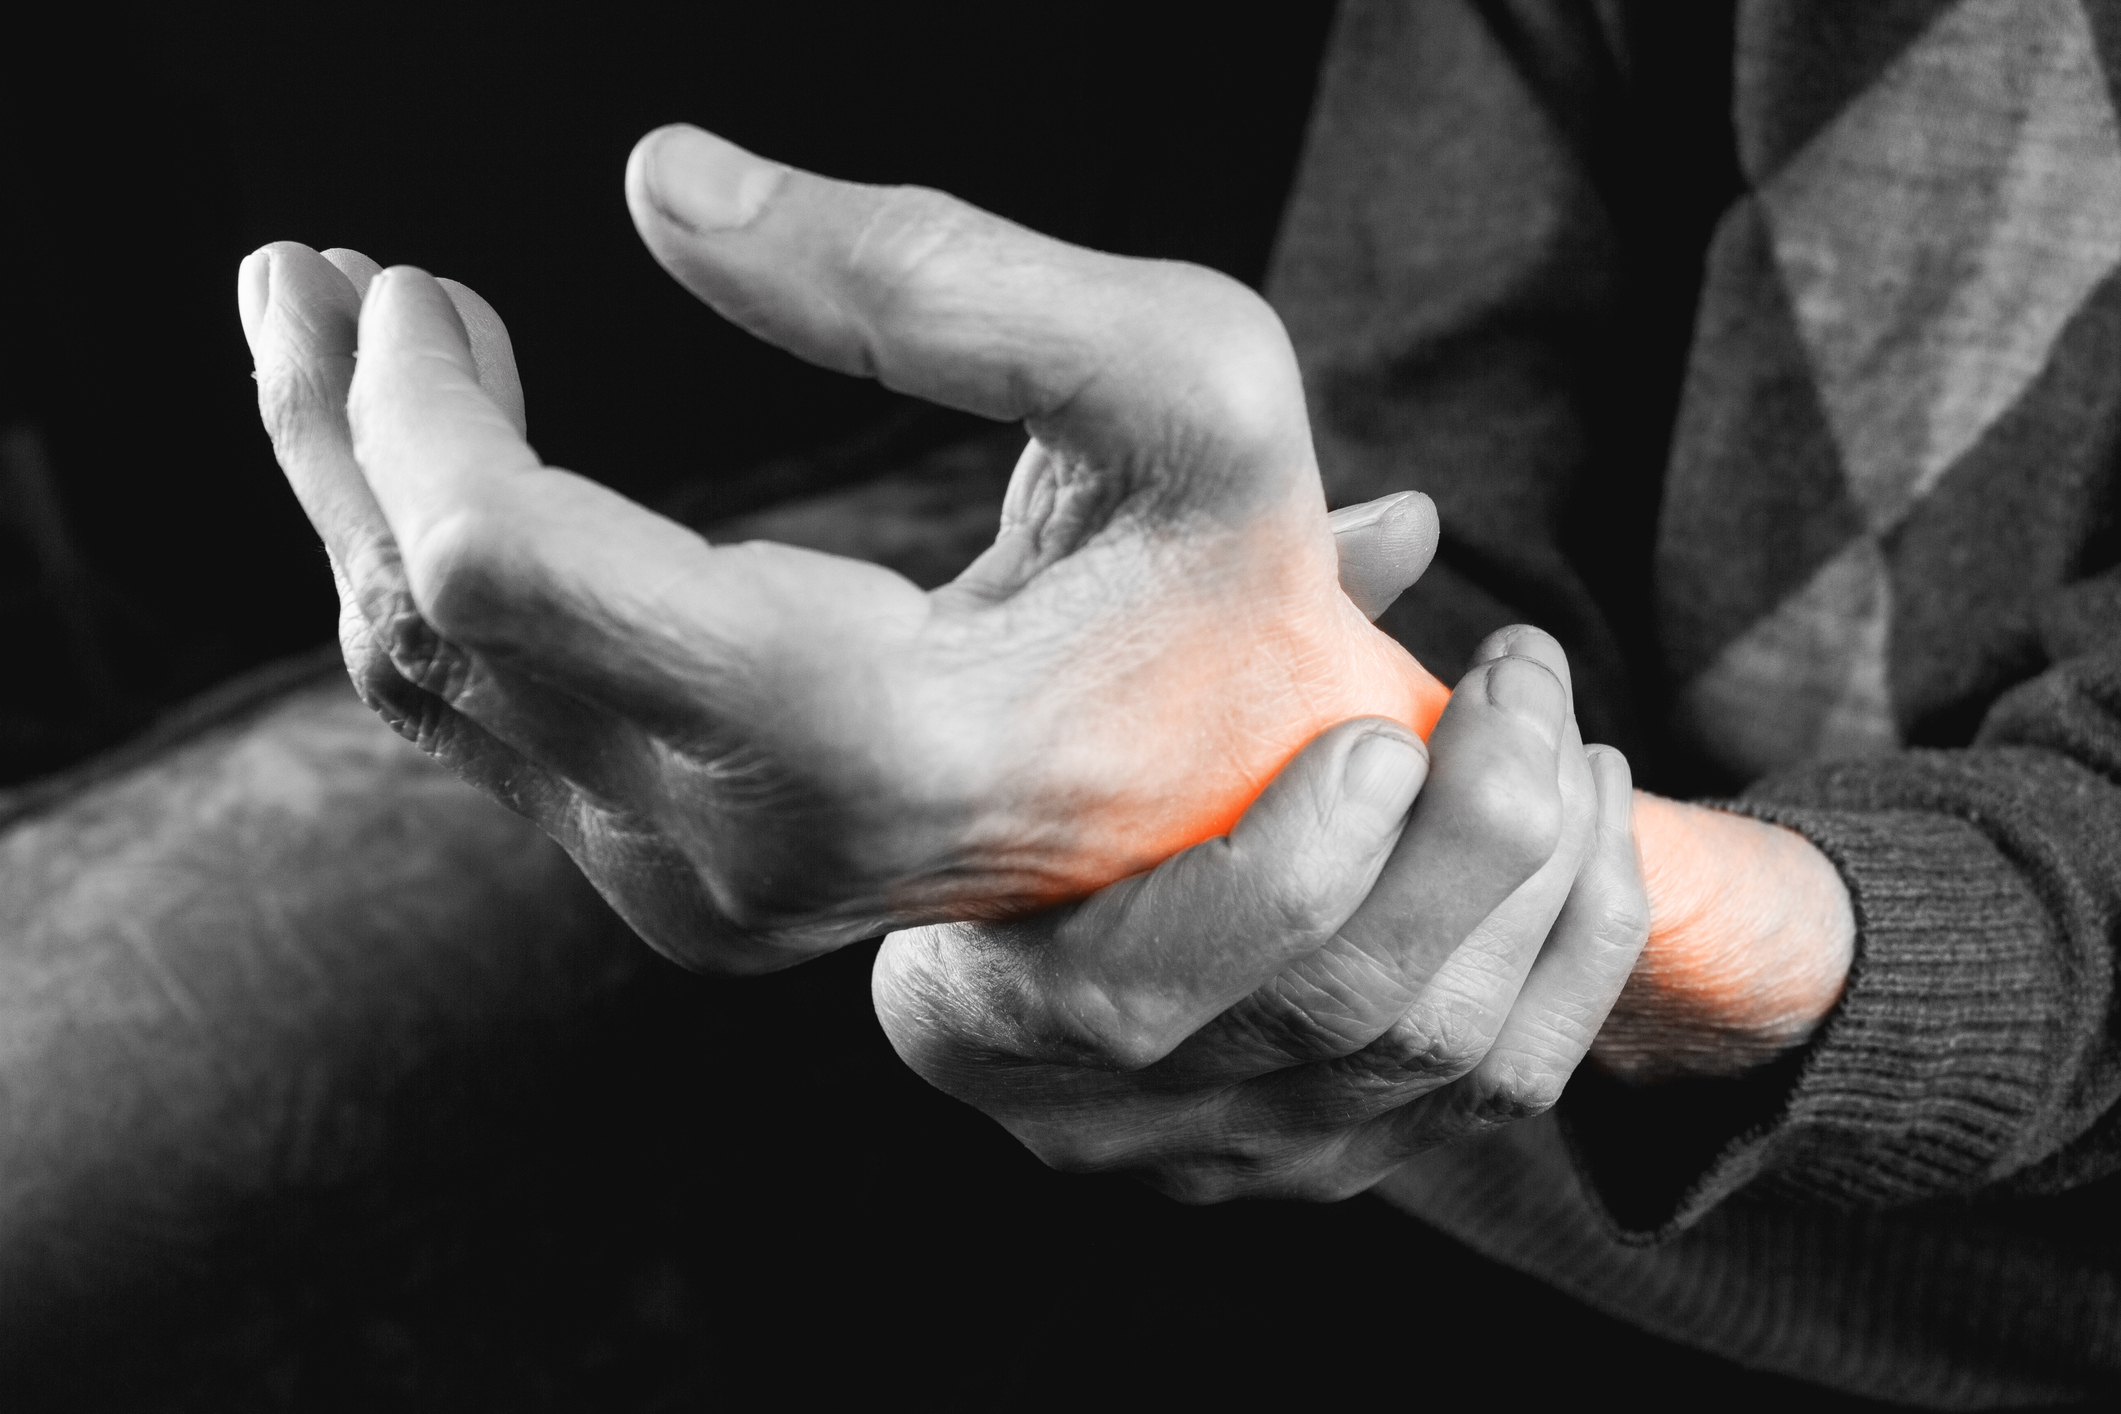 tratamentul unei articulații prolapsate a unei mâini